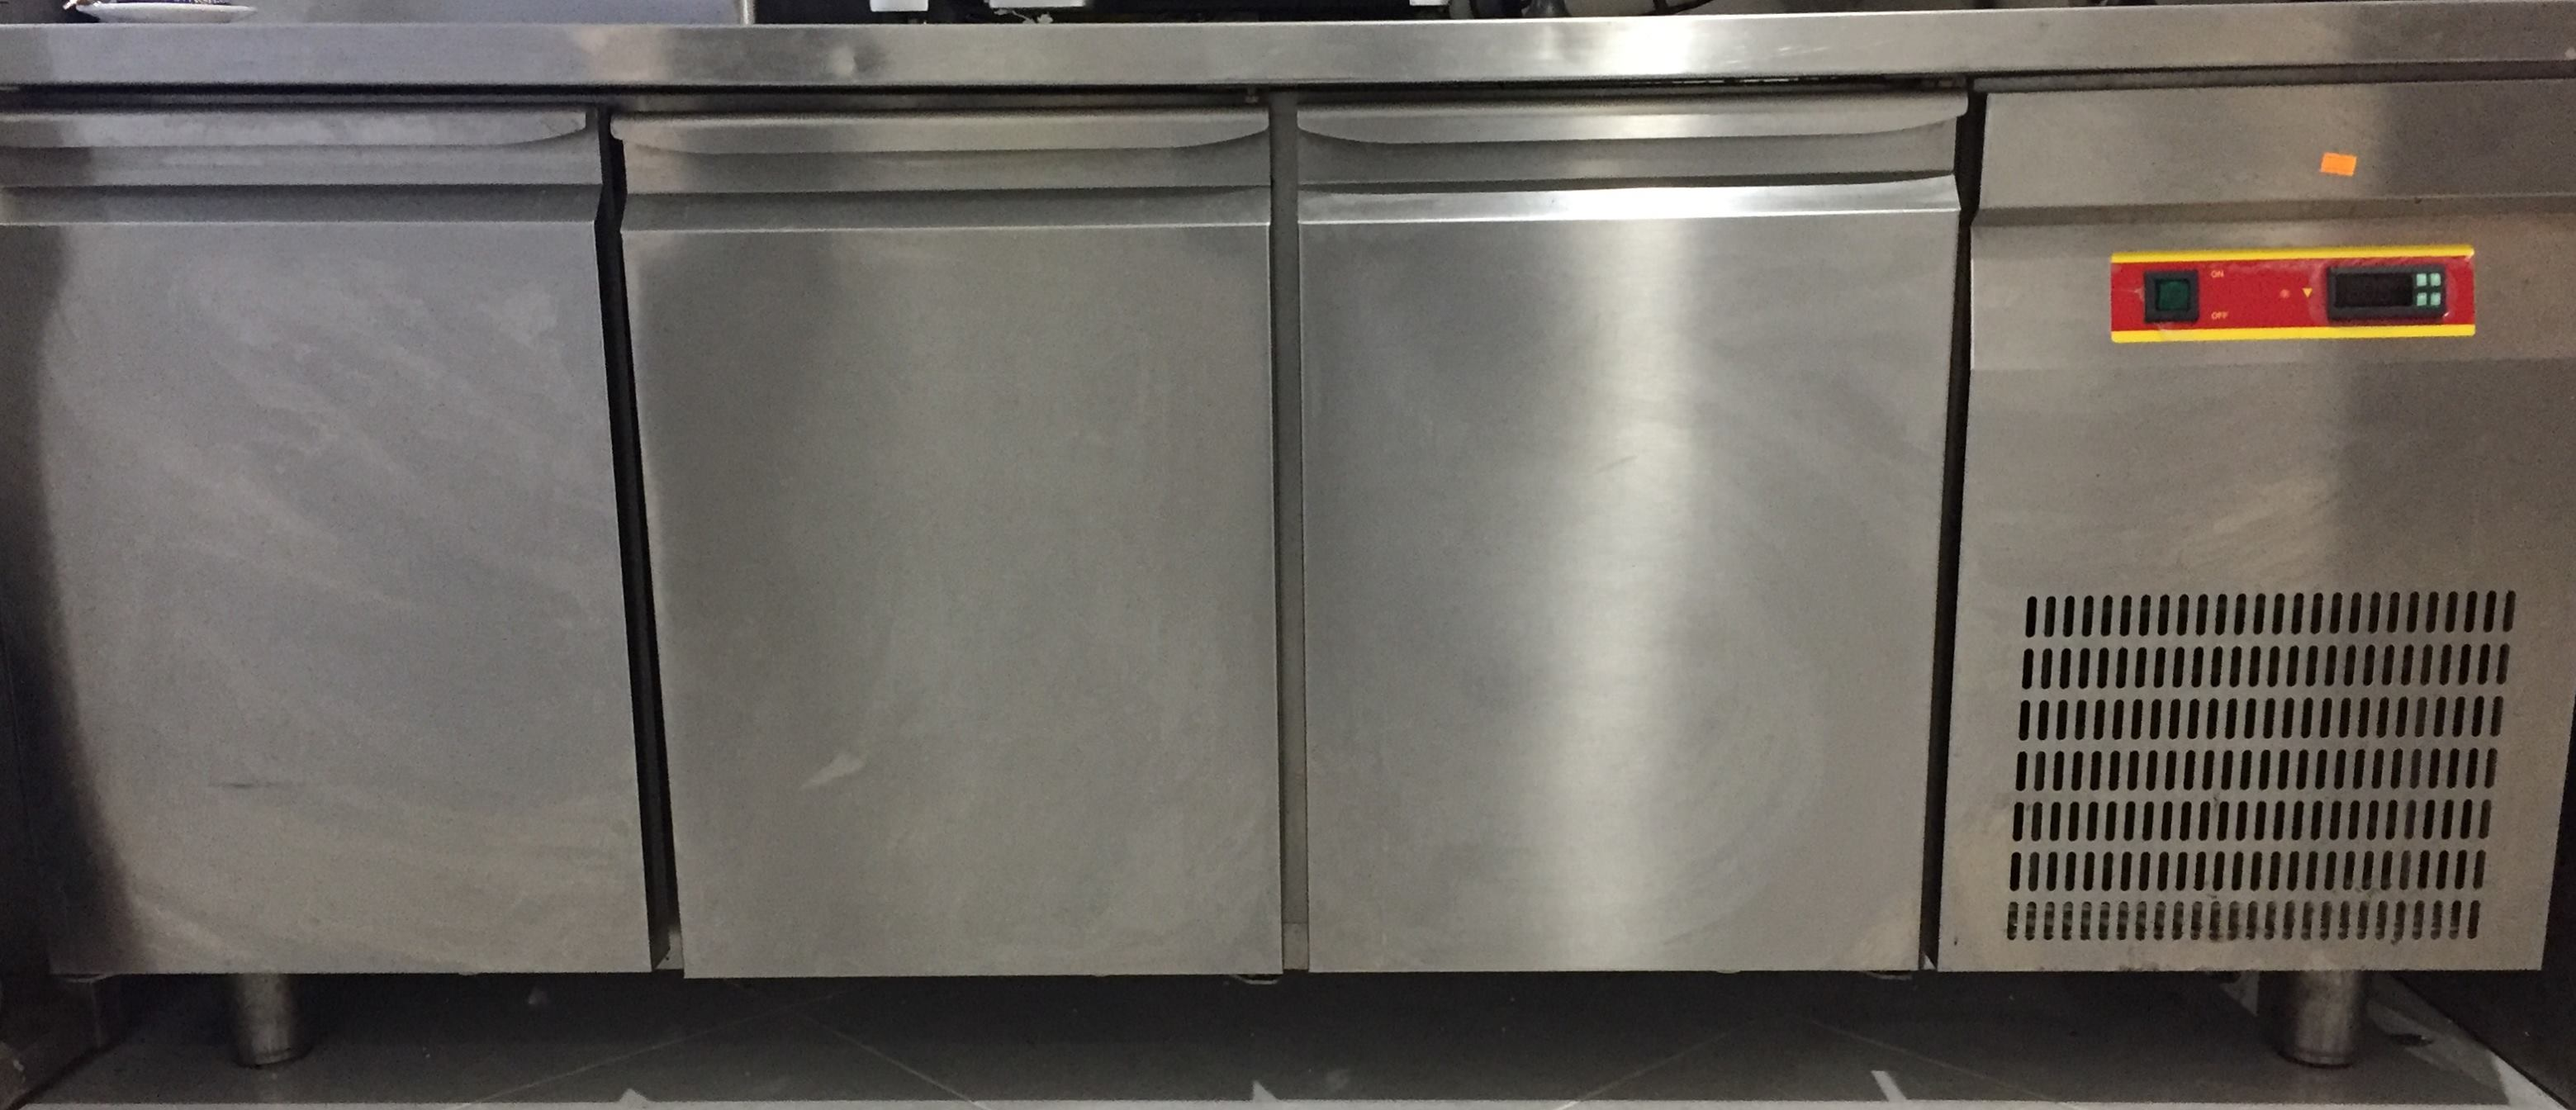 frigorifer banak